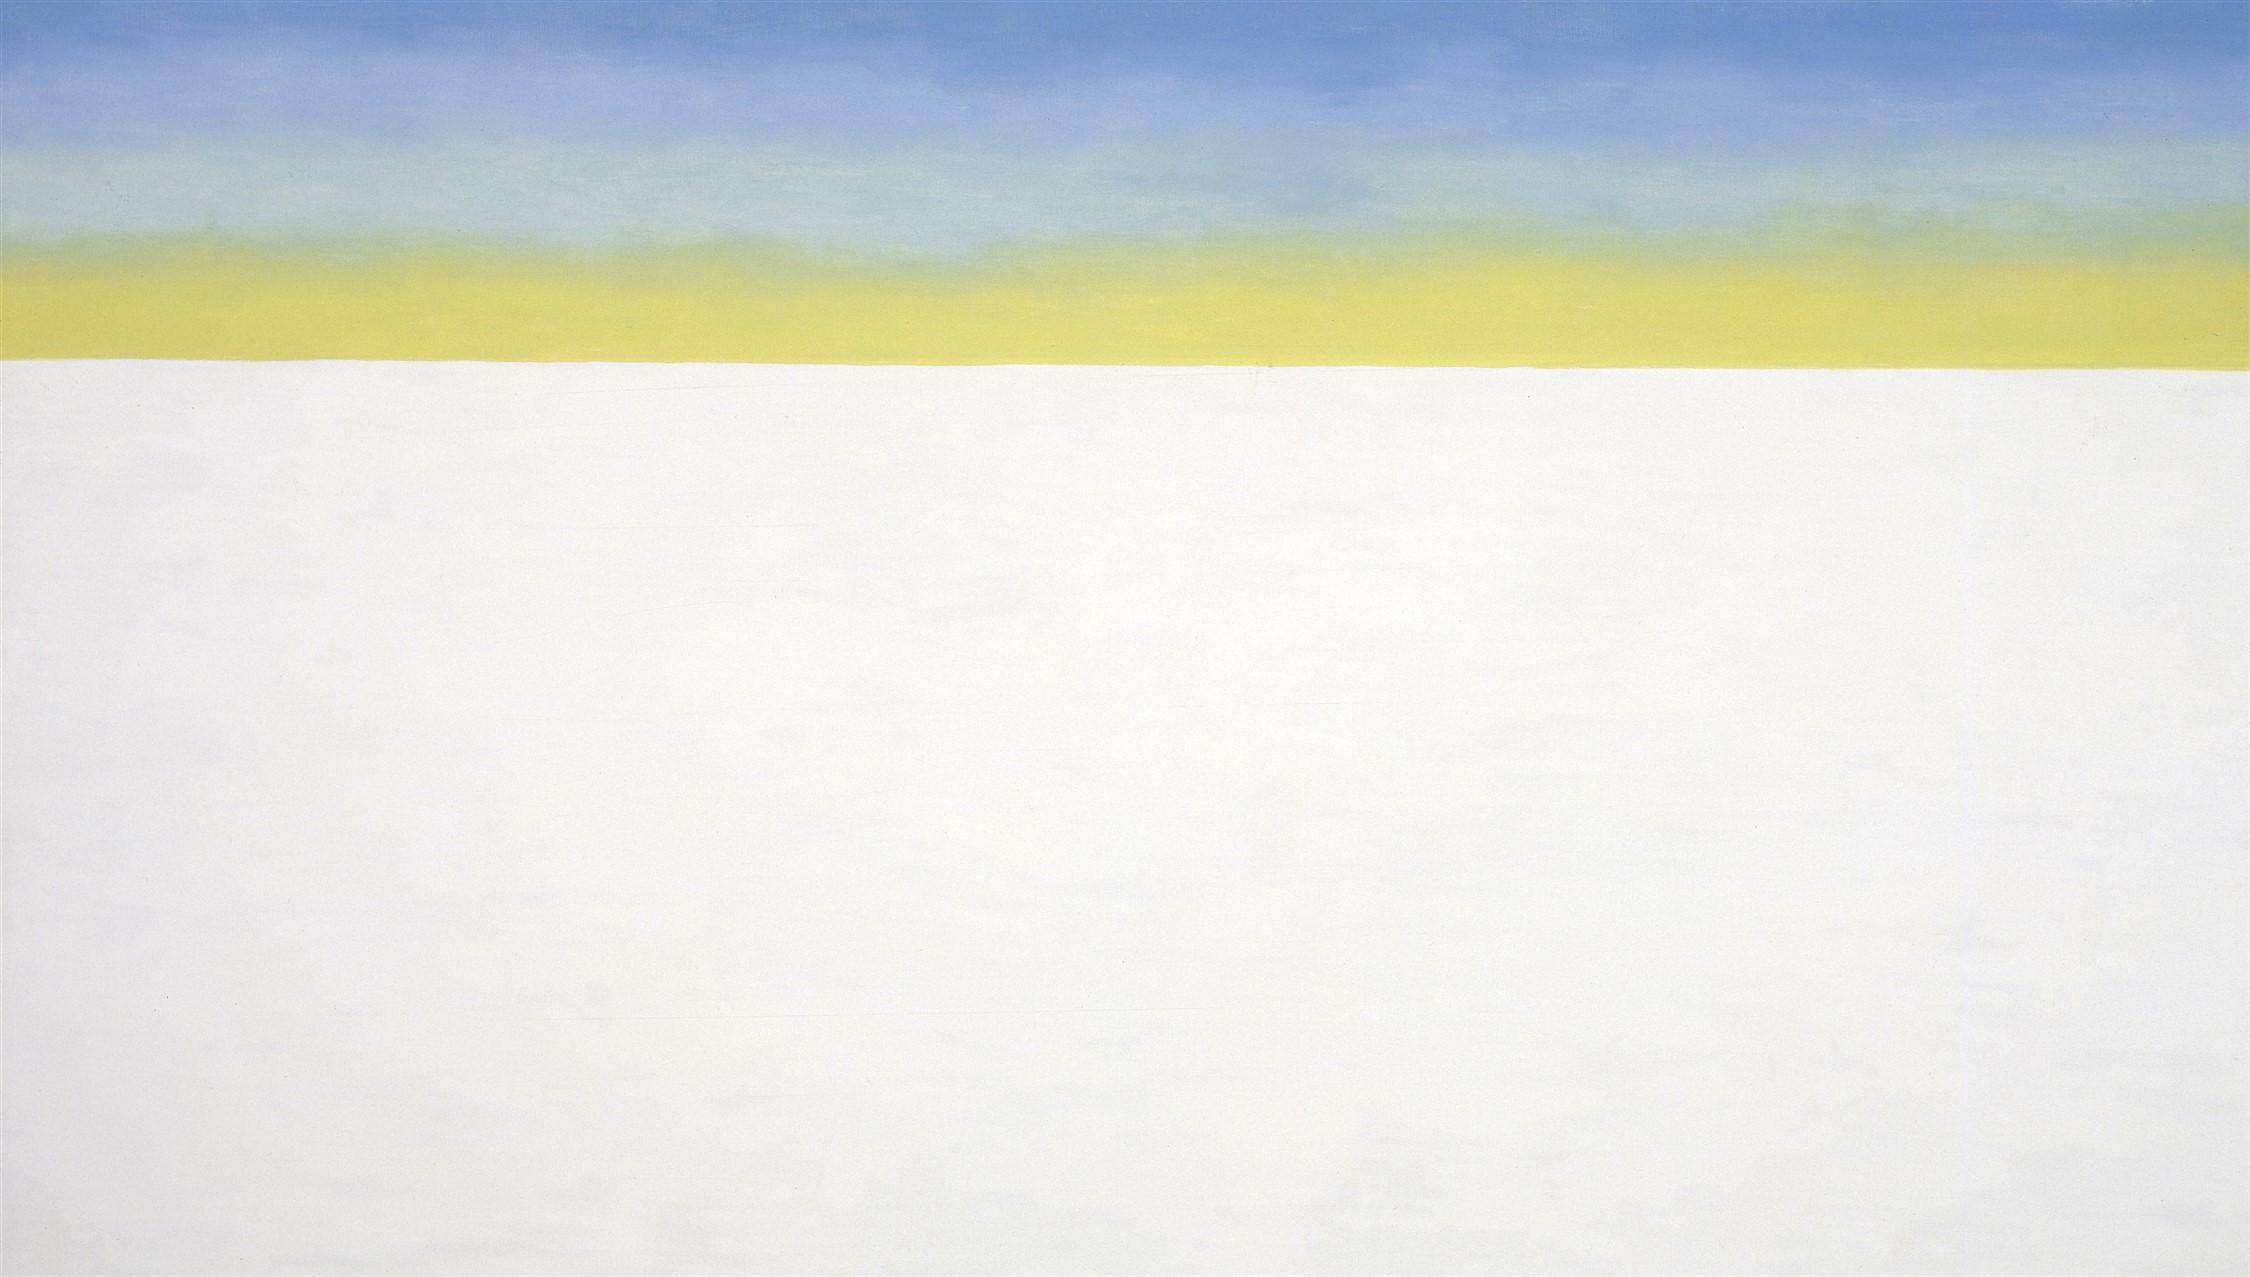 Georgia O'Keeffe Sky Above Clouds/Yellow Horizon and Clouds, 1976-1977 Huile sur toile, 121,9 × 213,4 cm Georgia O'Keeffe Museum, Santa Fe. Gift of The Georgia O'Keeffe Foundation Courtesy Georgia O'Keeffe Museum, Santa Fe  © Georgia O'Keeffe Museum / Adagp, Paris, 2021